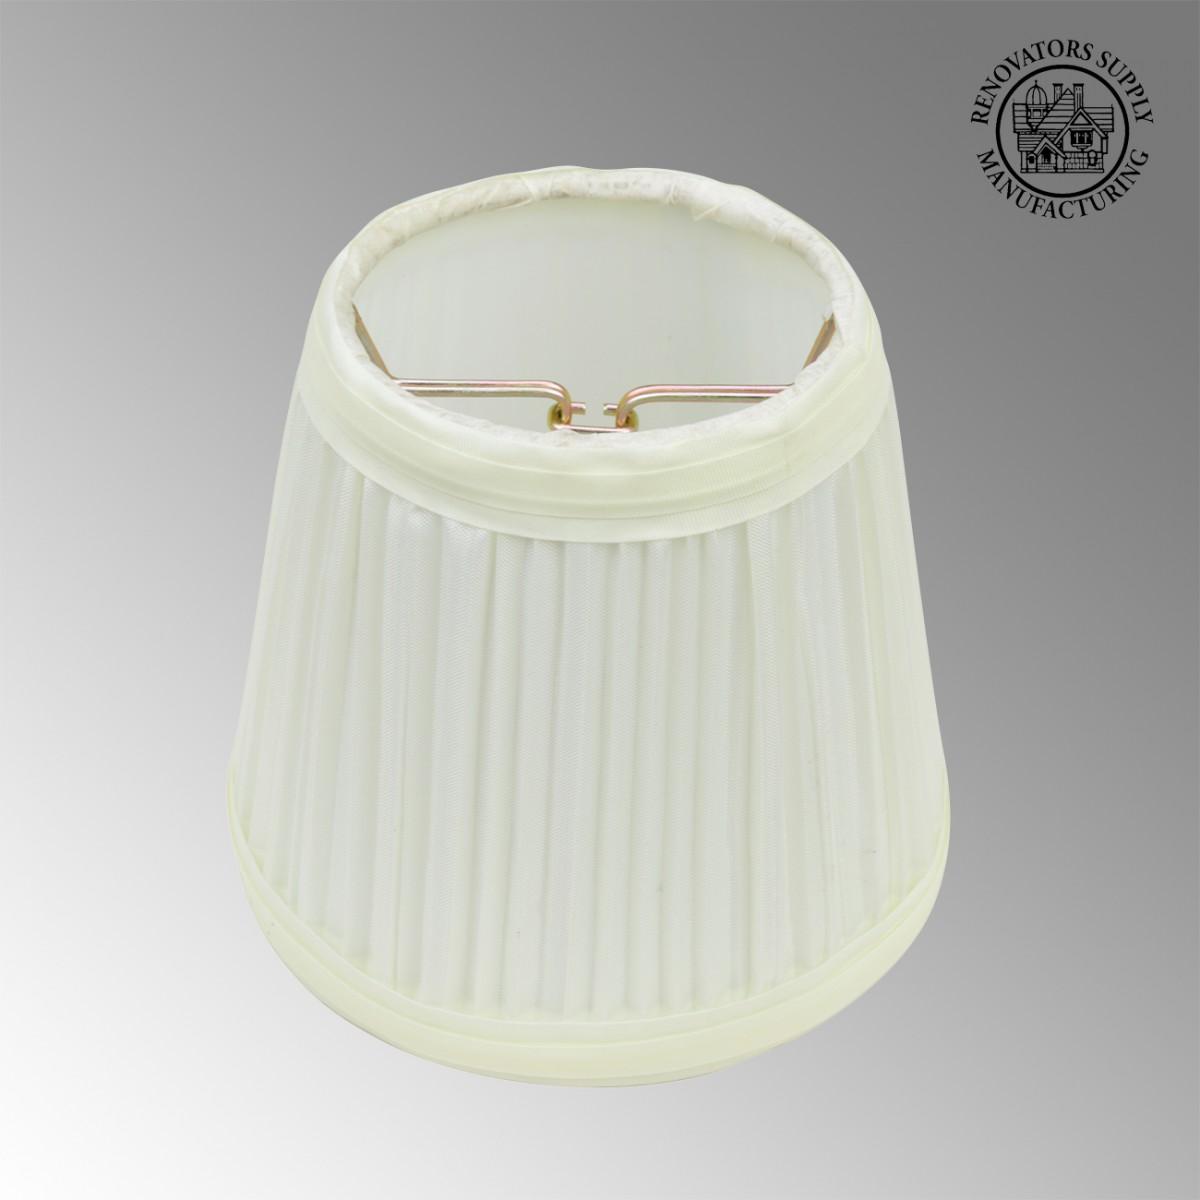 lamp shade eggshell white fabric 4 1 2 mini drum clip on. Black Bedroom Furniture Sets. Home Design Ideas